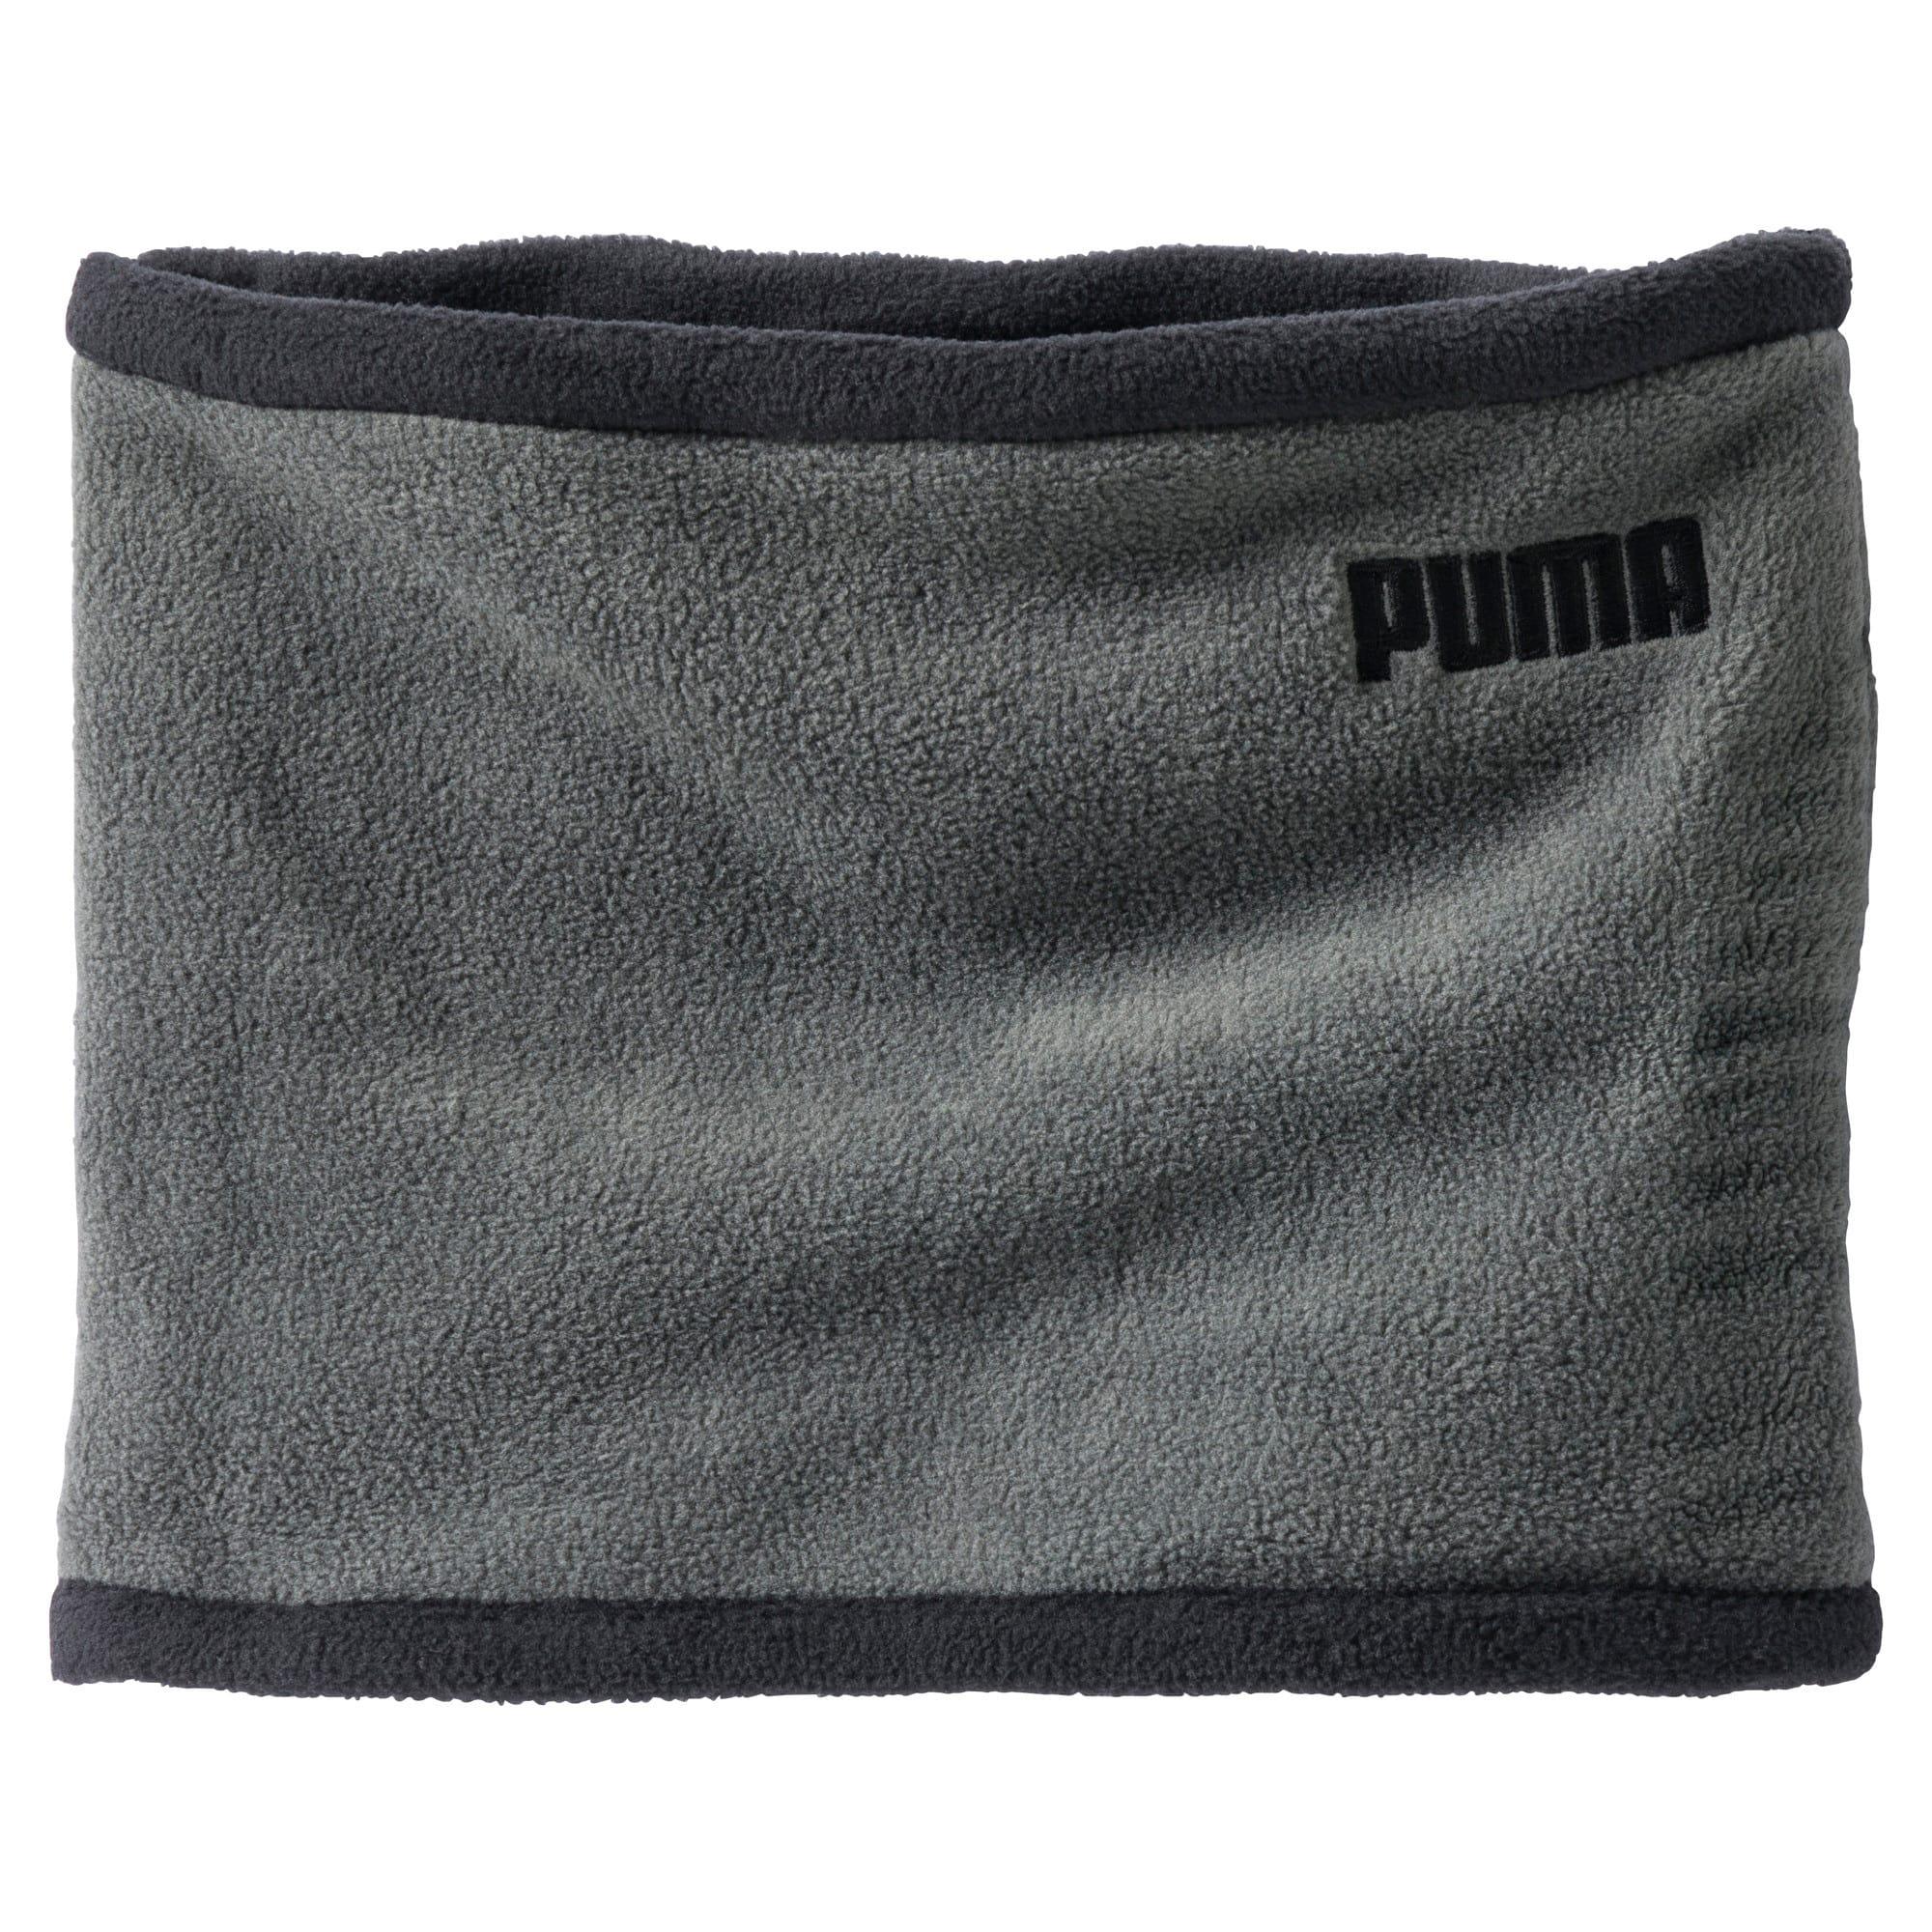 Thumbnail 1 of Fleece rever-nekwarmer, Puma Black-Dark Shadow, medium